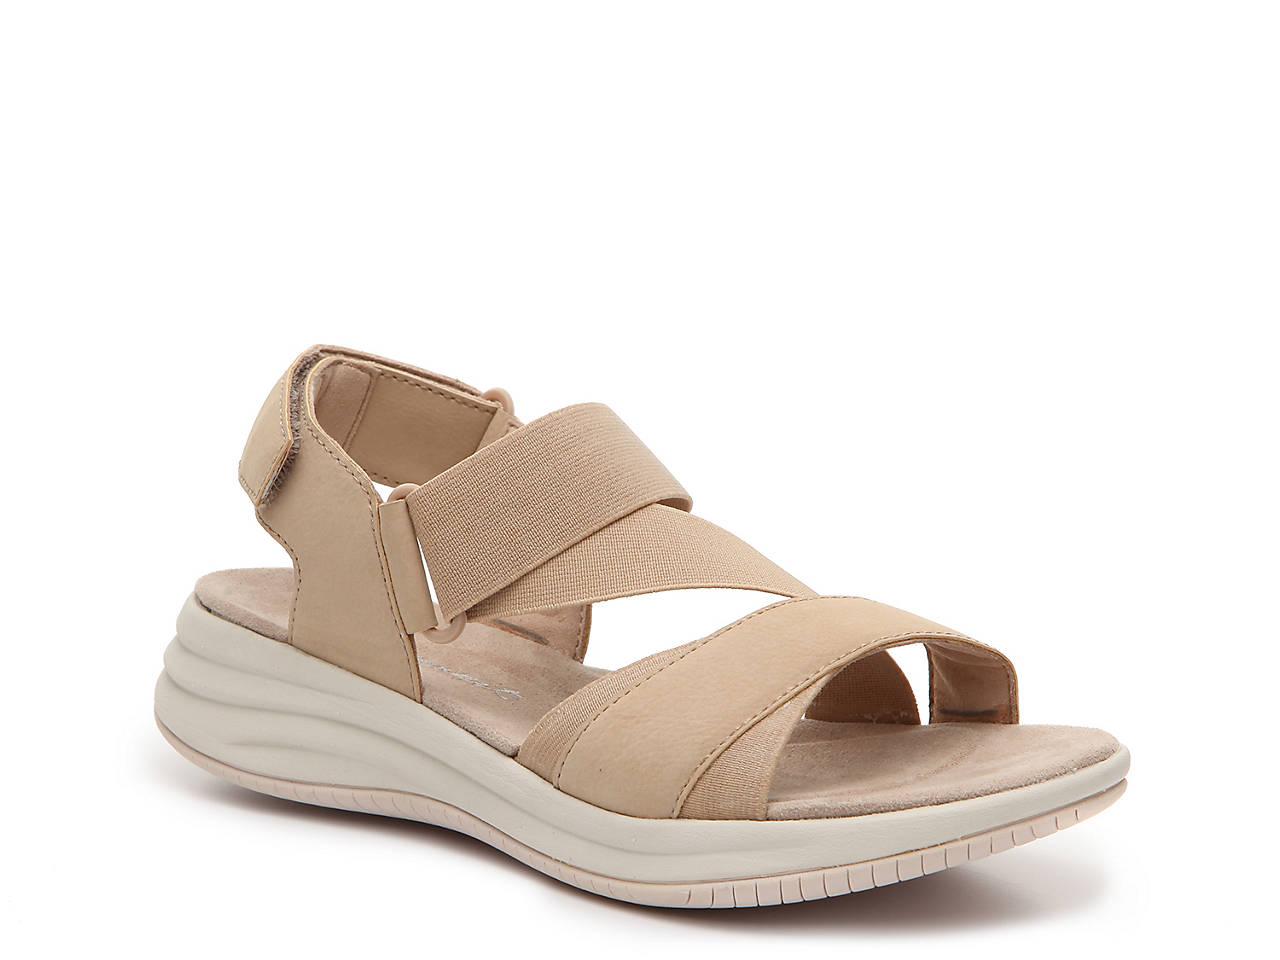 38bc2f04d59c Easy Spirit Dartz Sandal Women s Shoes